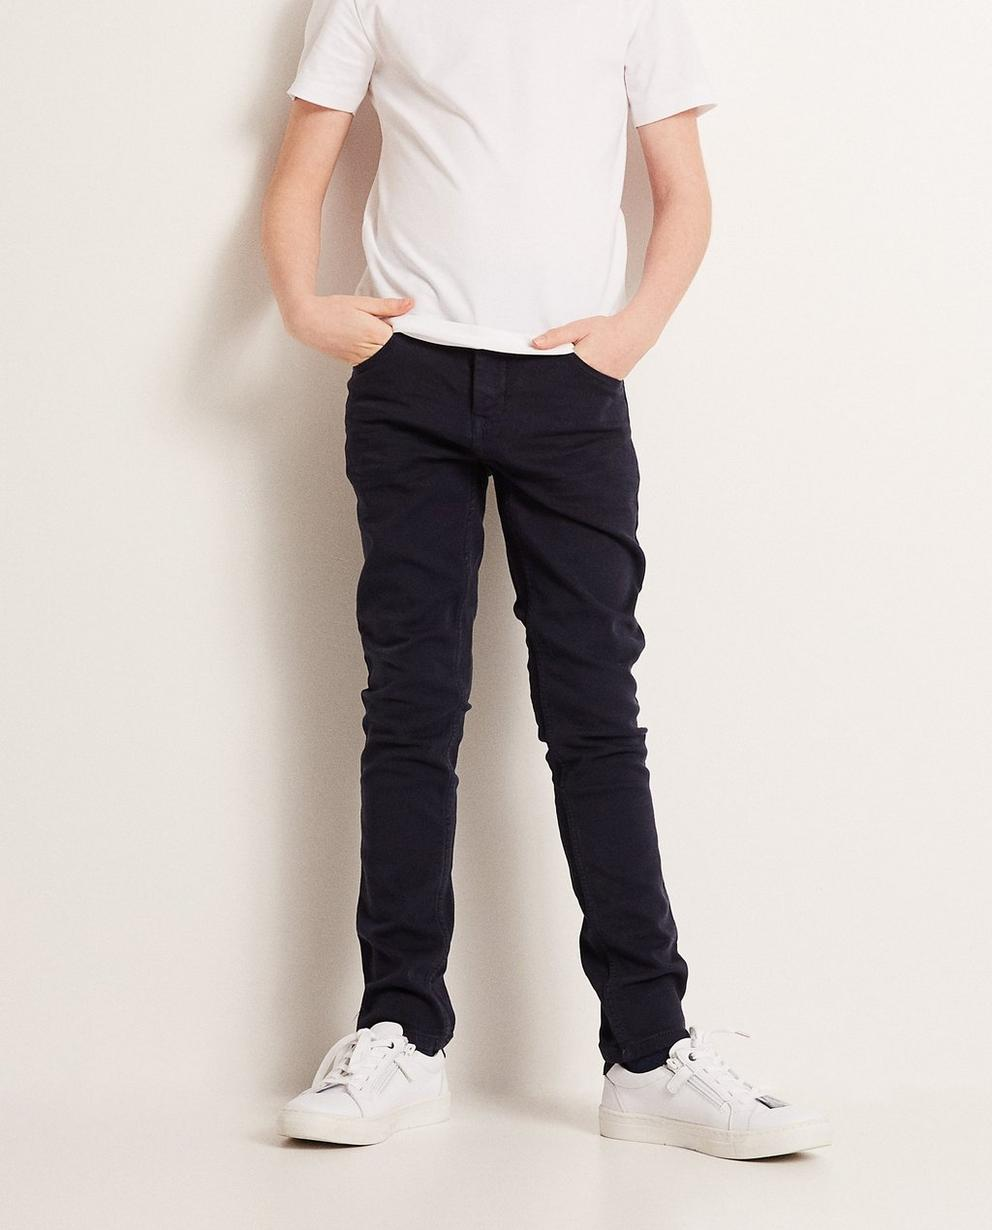 Hosen - Navy - Skinny Jeans JOEY, 7-14 Jahre